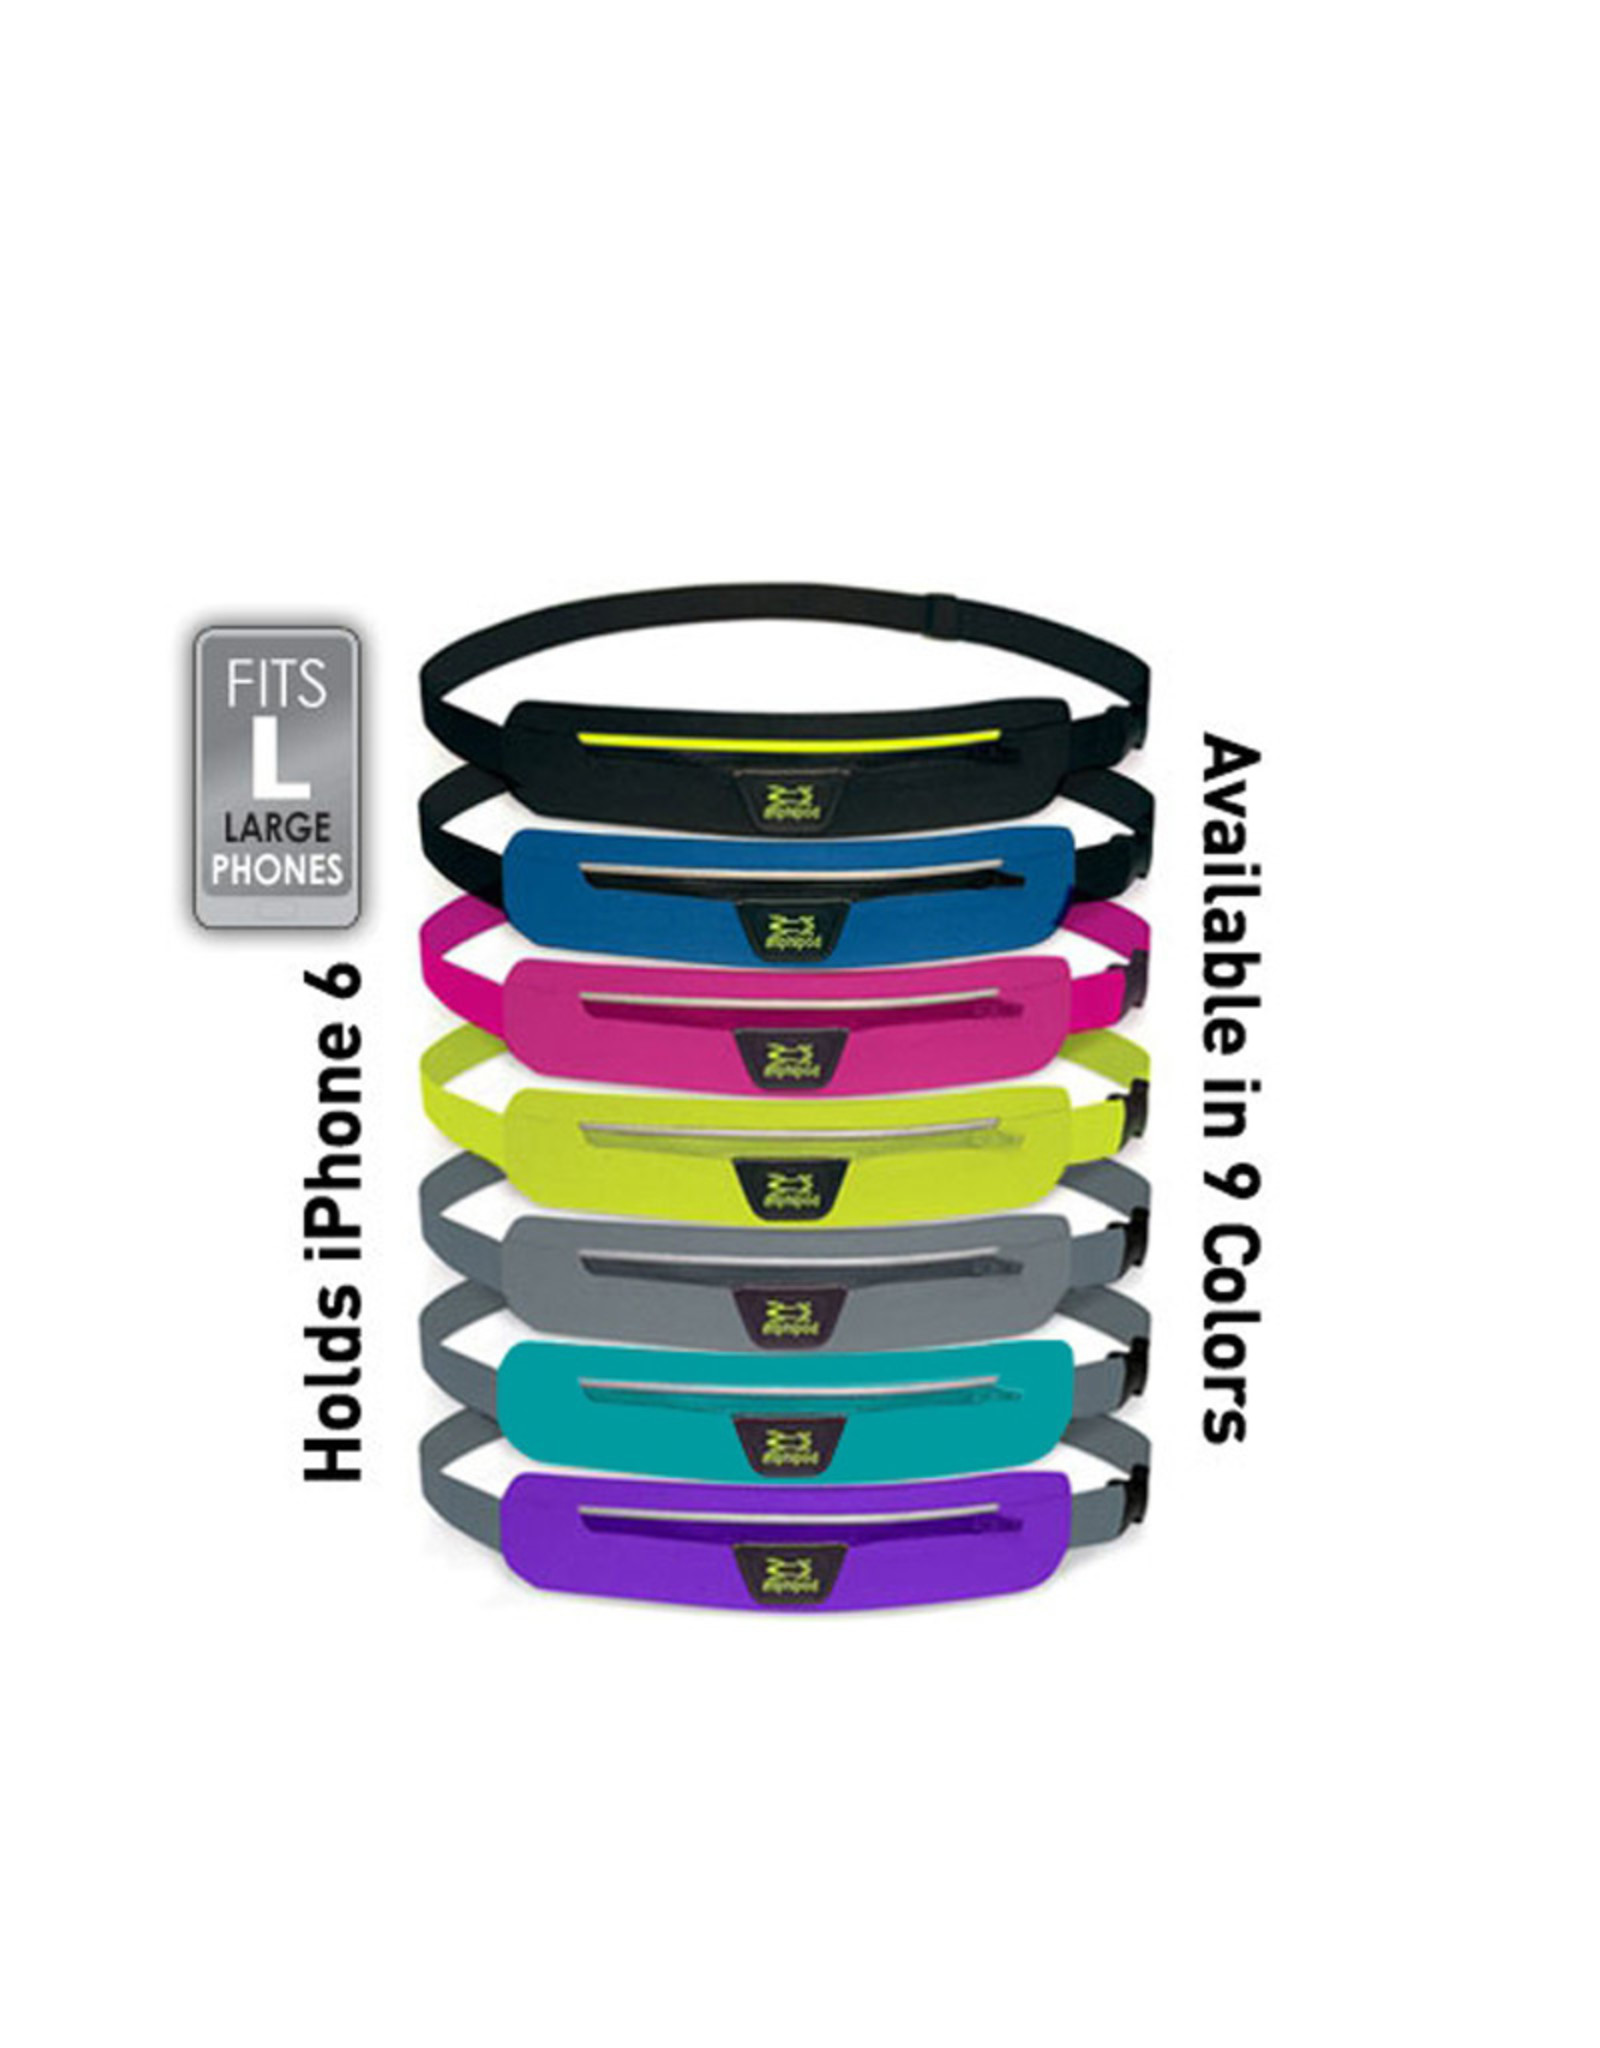 Amphipod AirFlow MicroStretch Belts